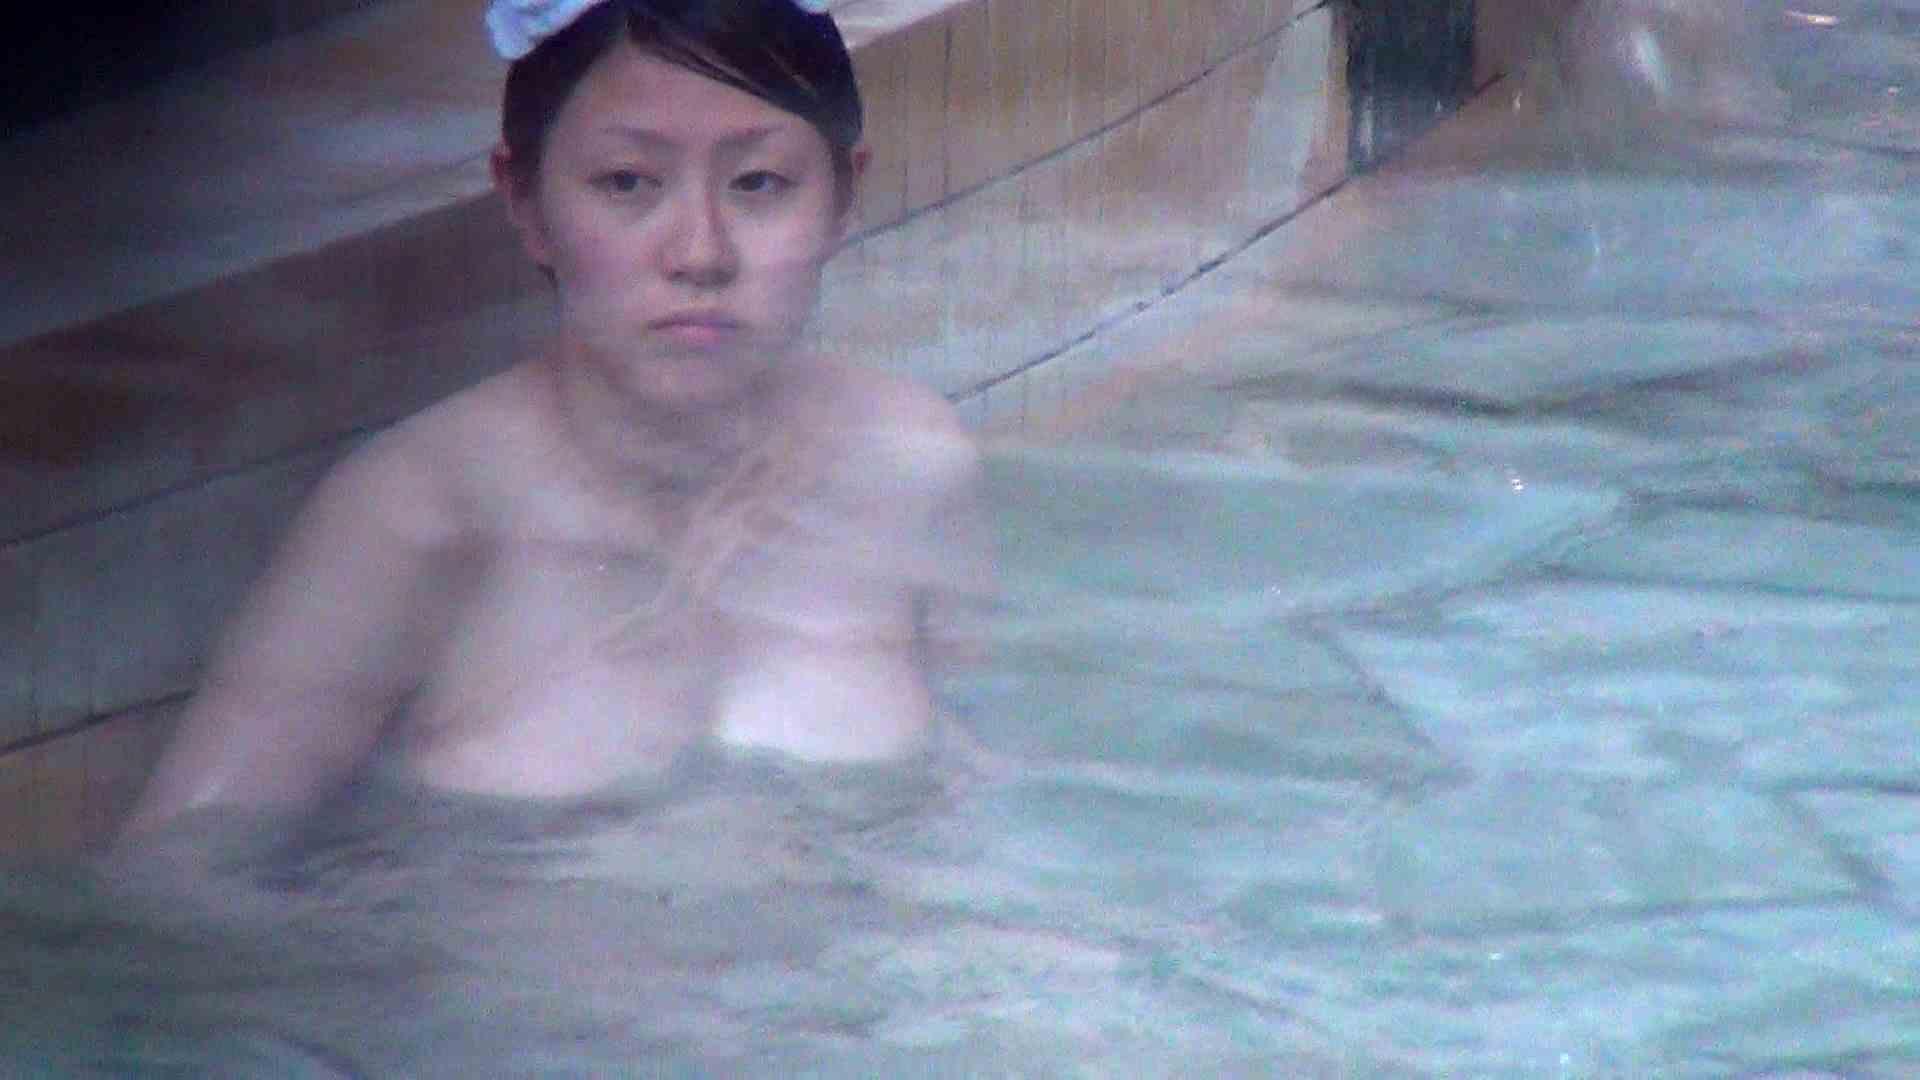 Aquaな露天風呂Vol.289 OLすけべ画像 AV無料 49連発 14